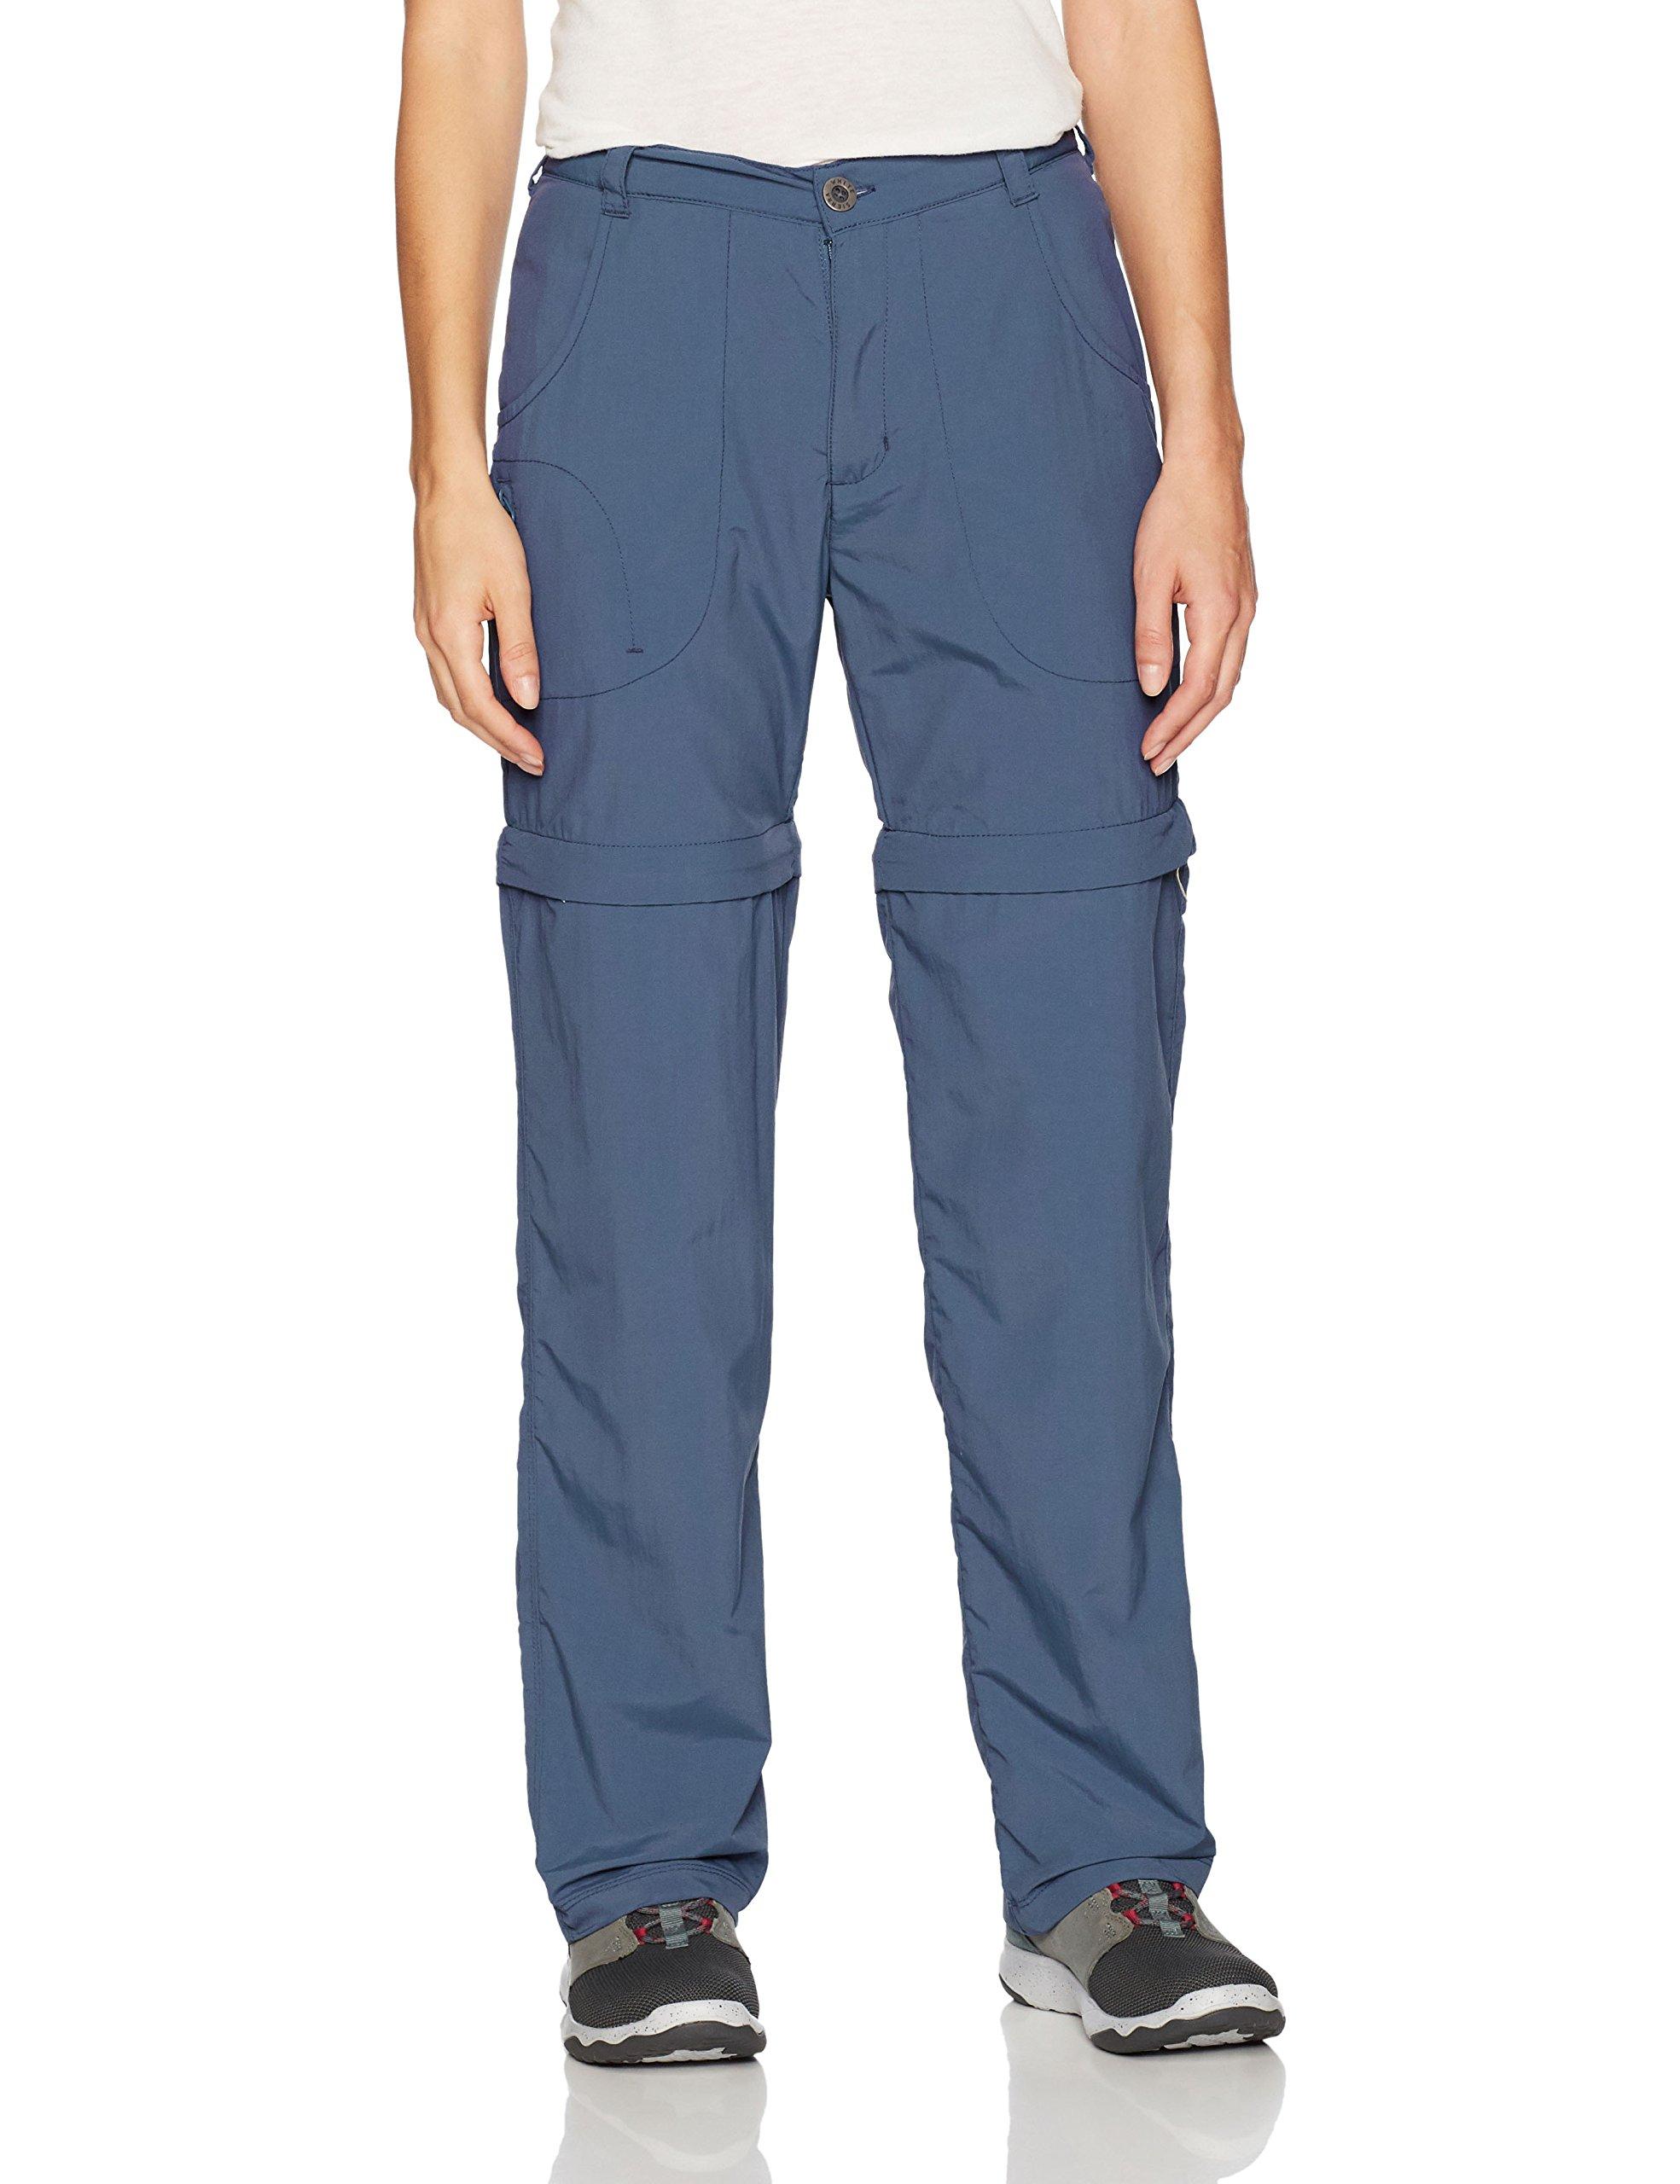 White Sierra Pt. 31'' Inseam Convertible Pants, Vintage Indigo, Large